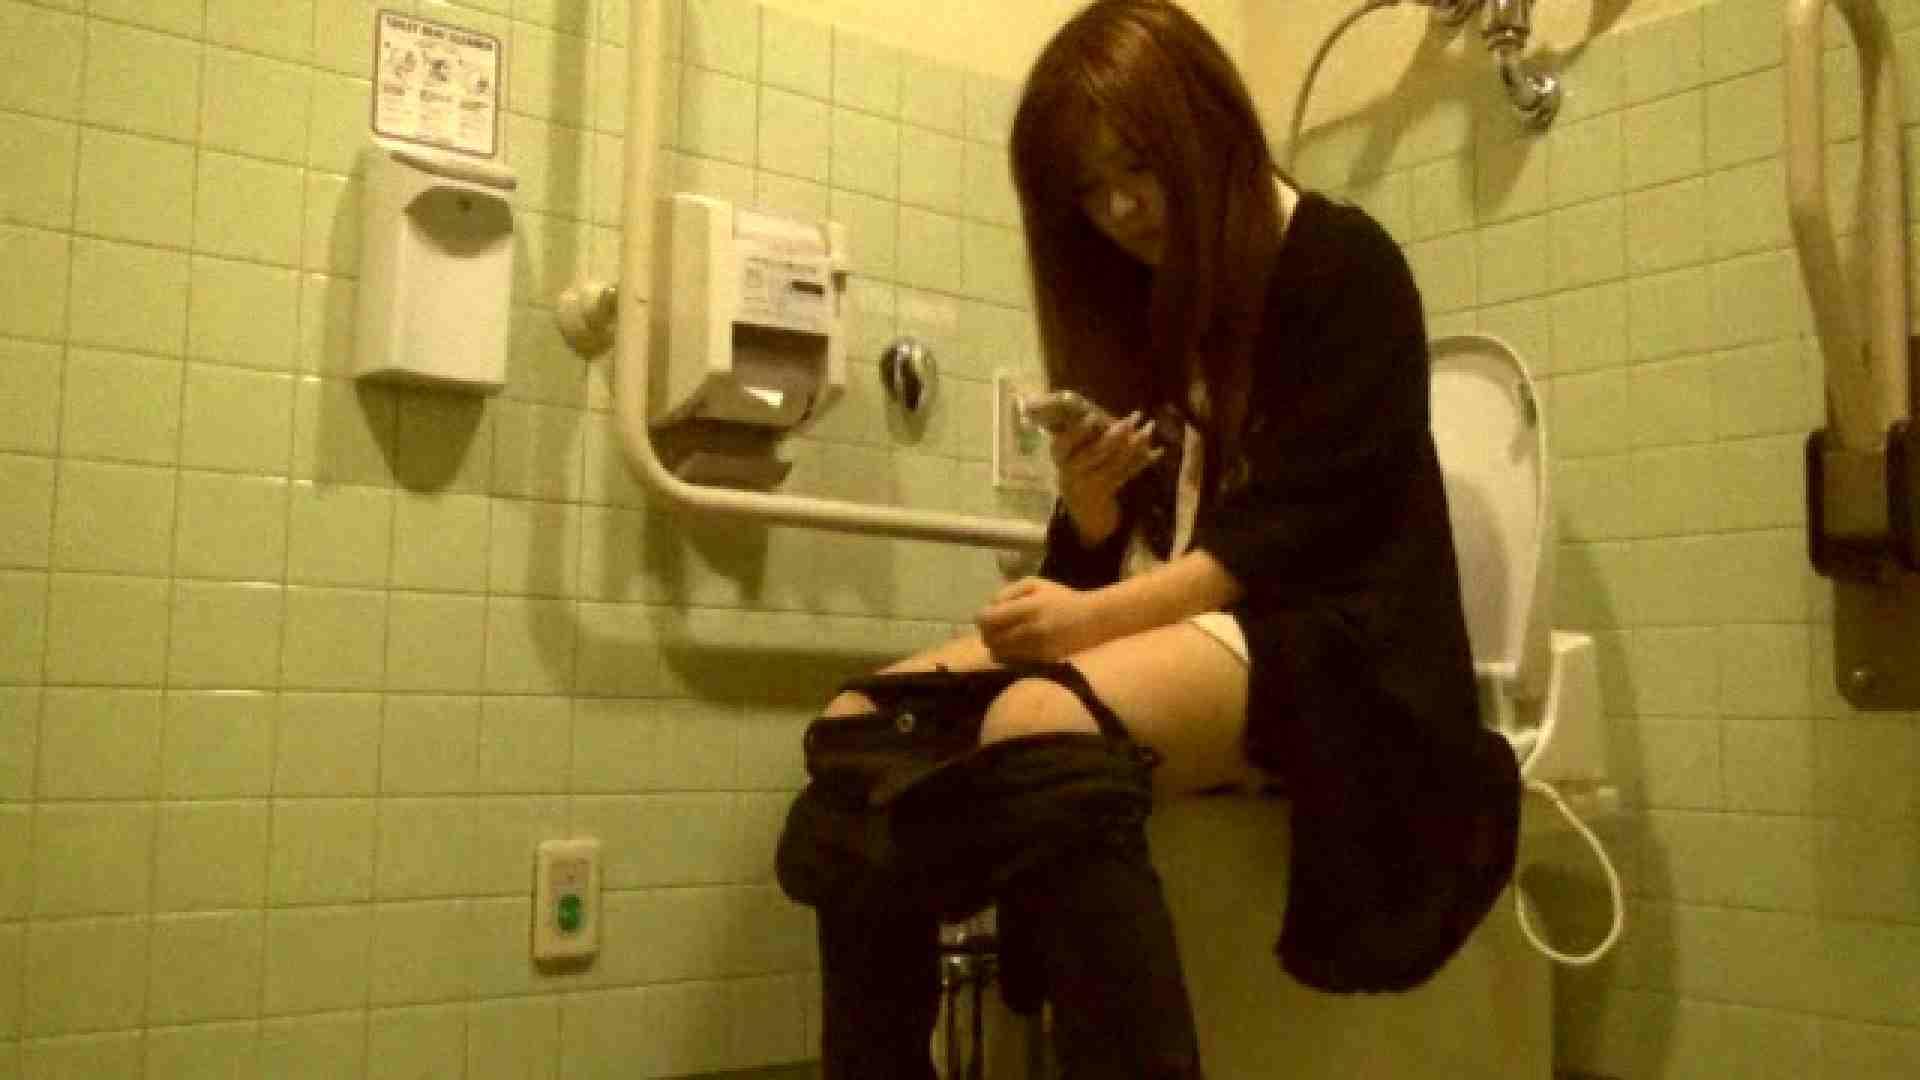 vol.26 【SKちゃん(洗面所)】ガールズバー店員 19歳 洗面所   キャバ嬢  56画像 29